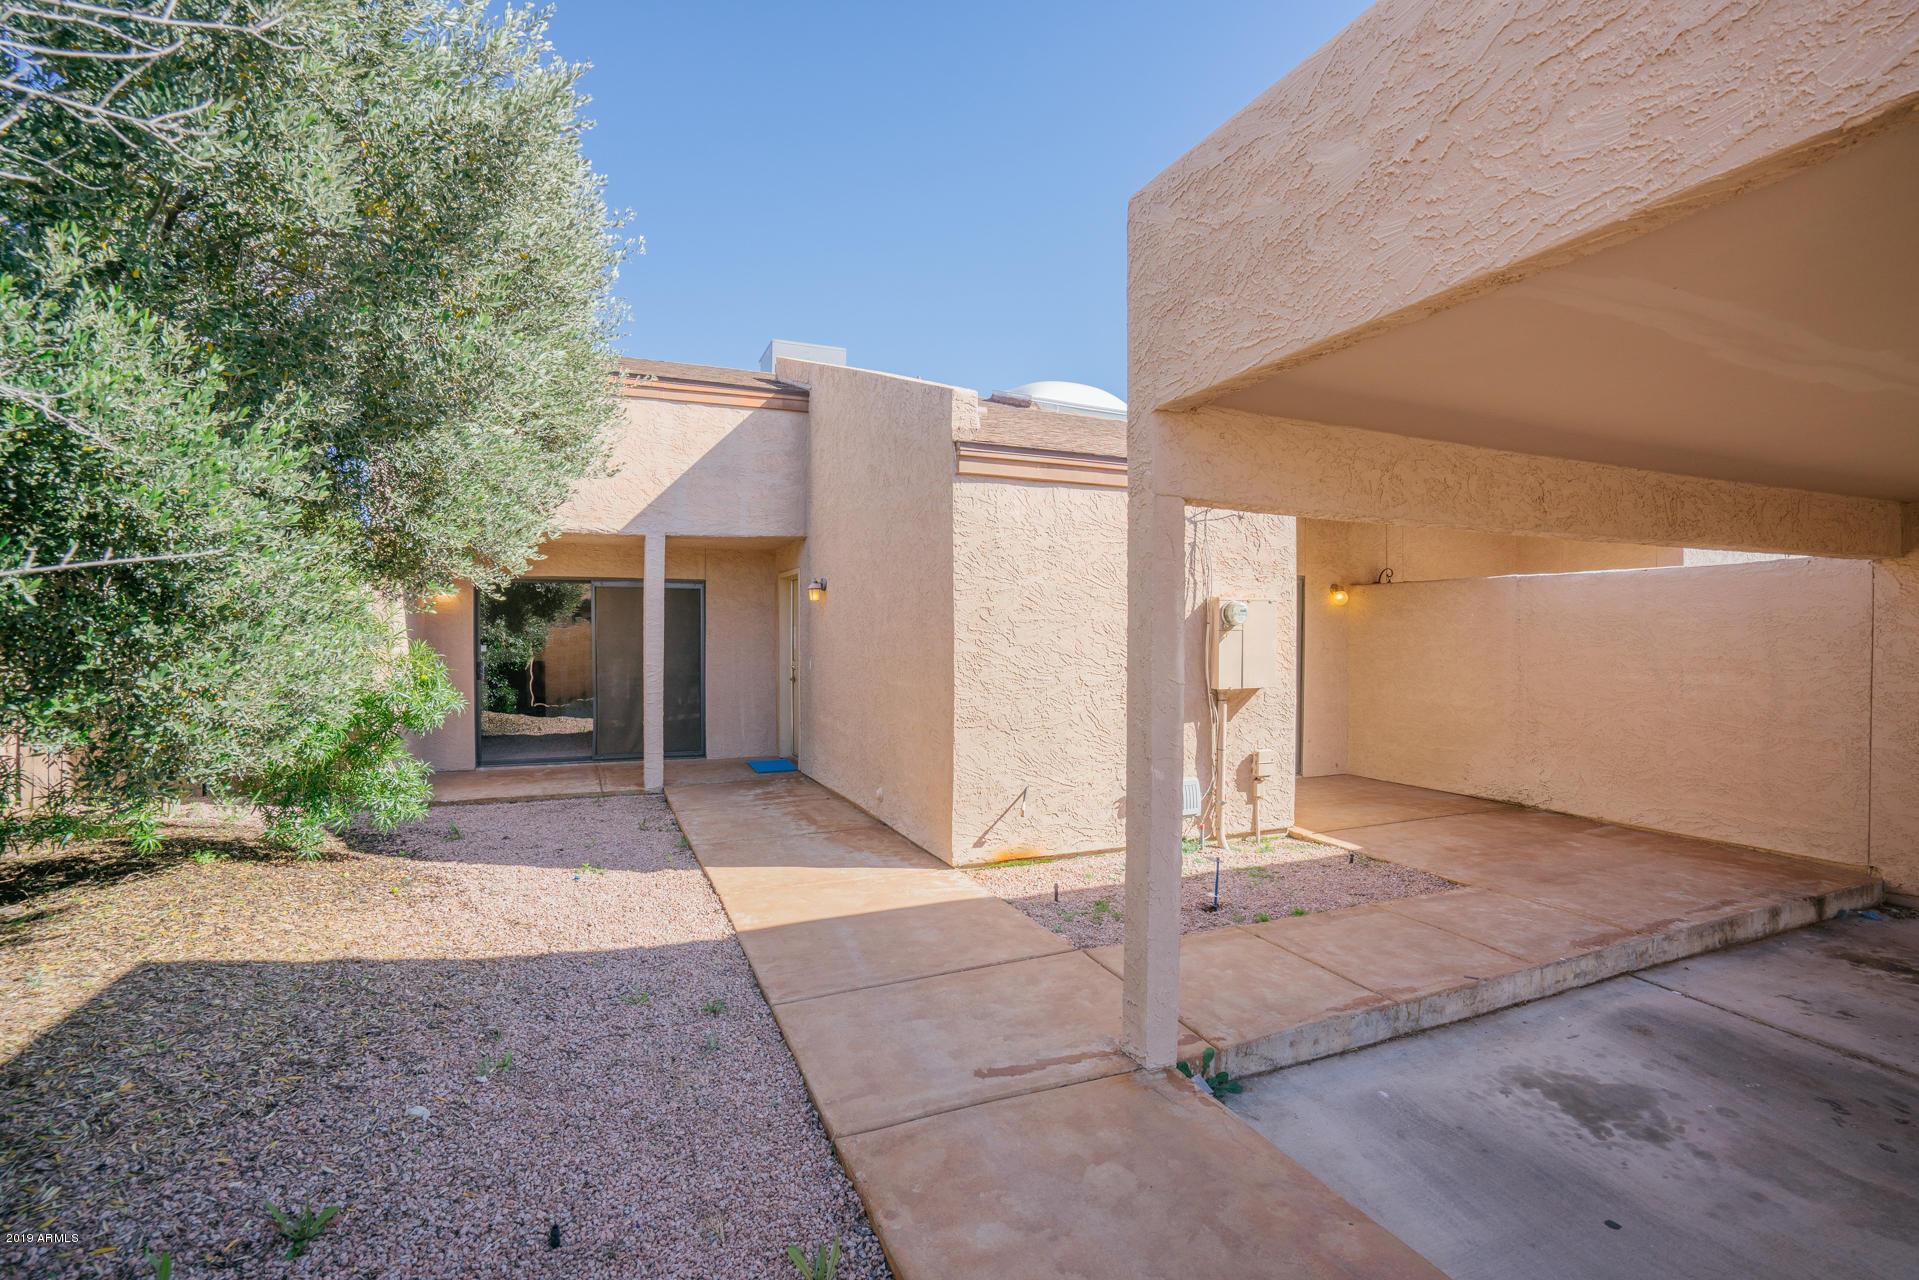 Photo of 2041 N 87TH Way #101, Scottsdale, AZ 85257